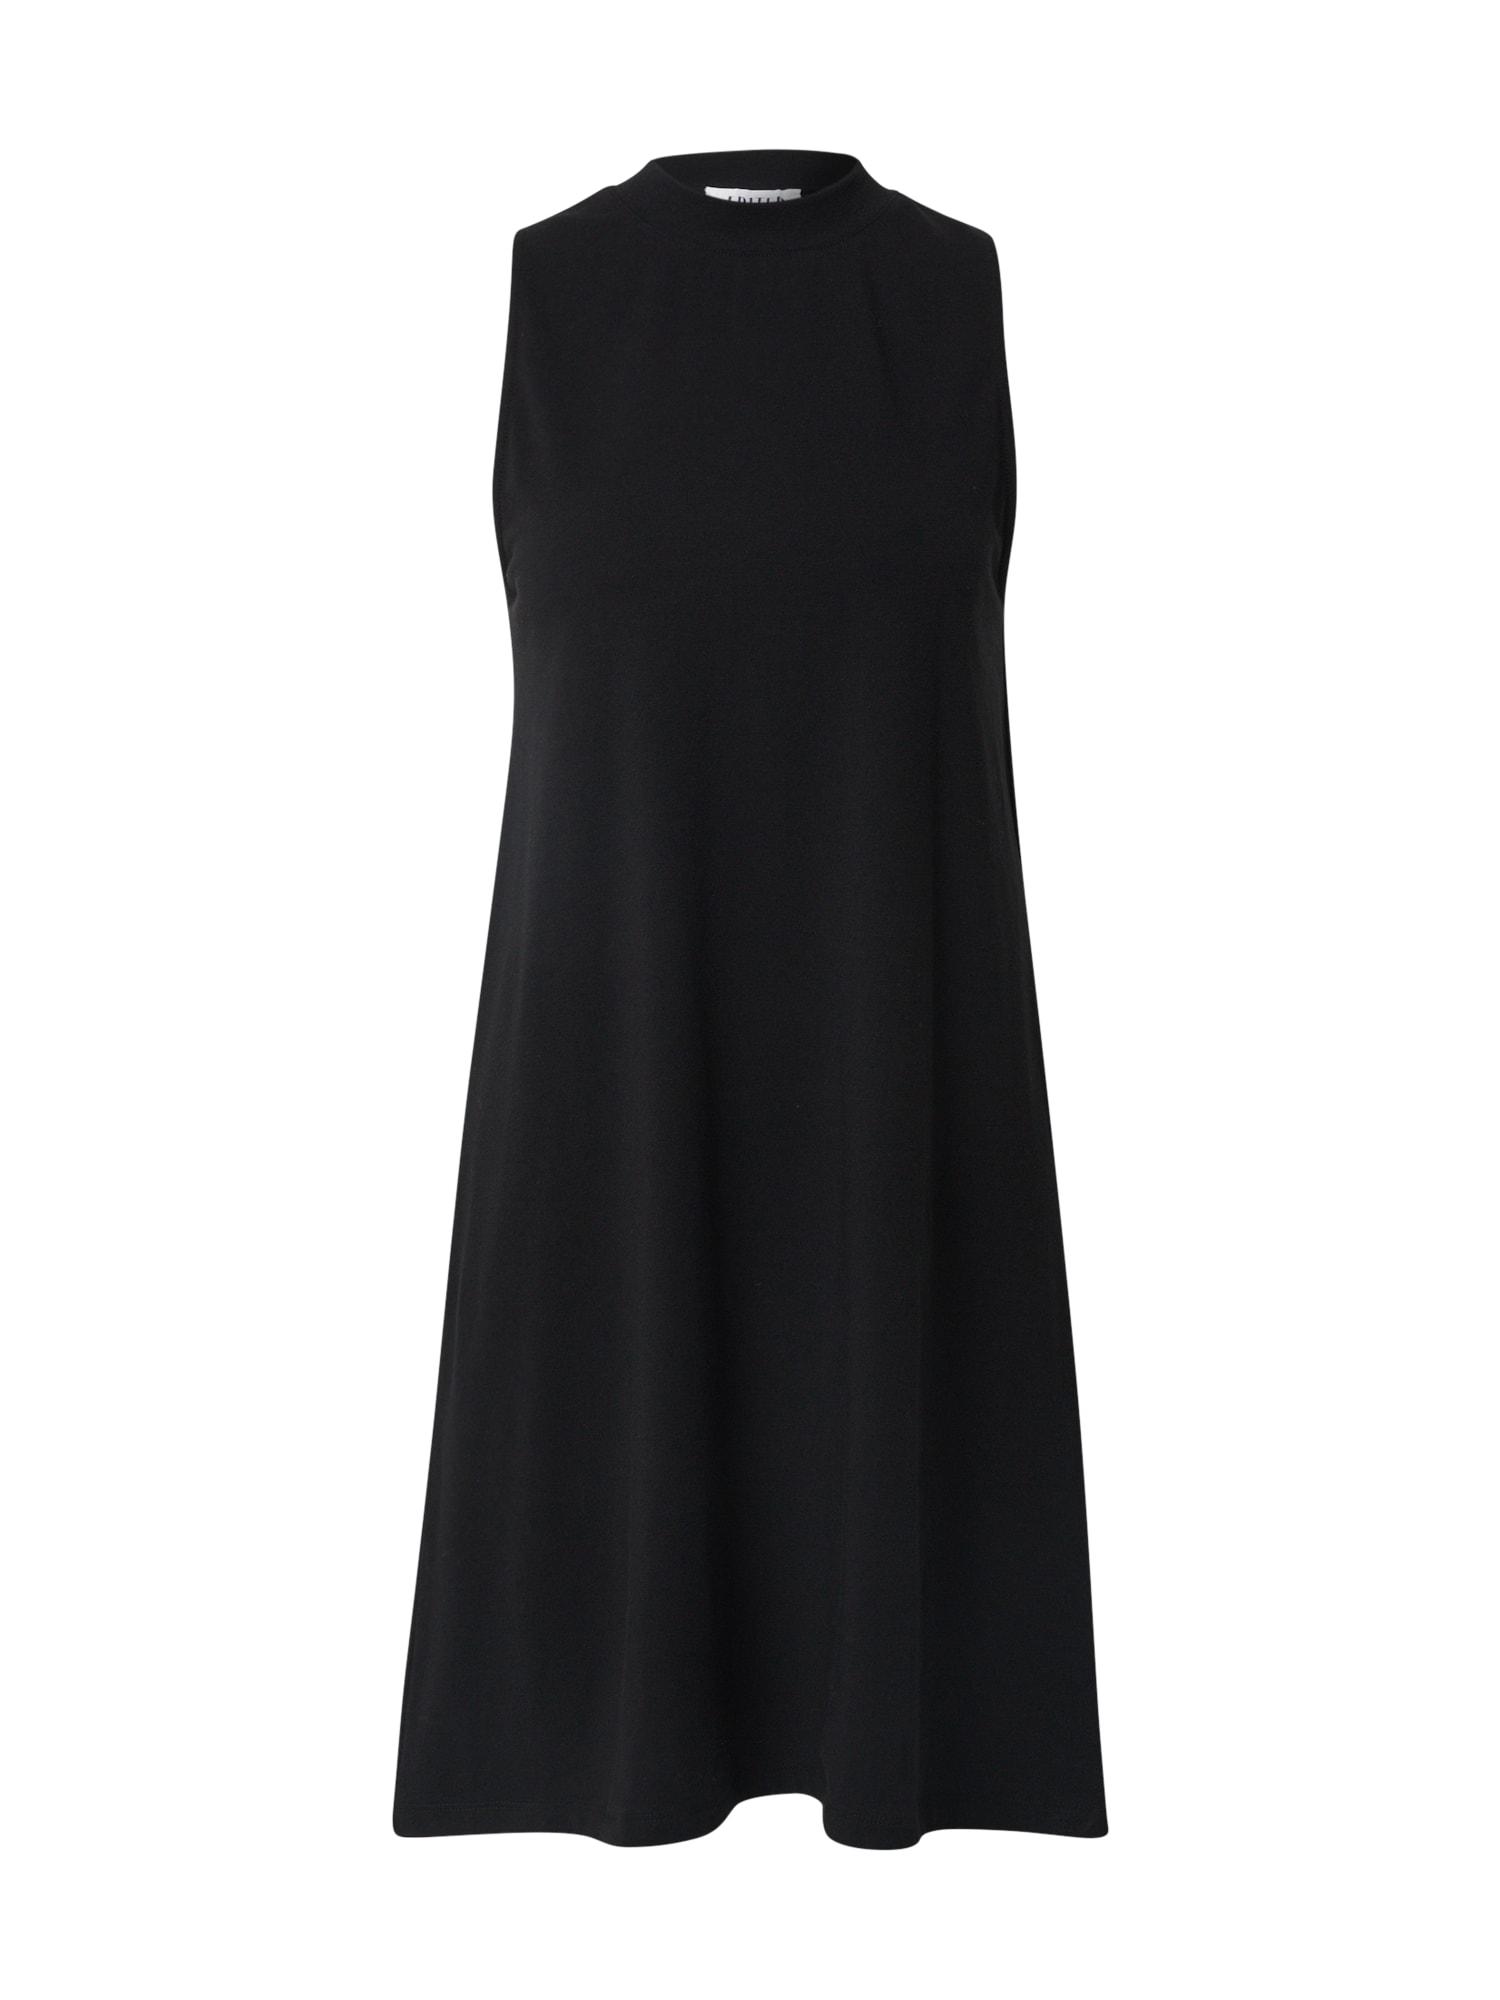 EDITED Suknelė 'Aleana' juoda